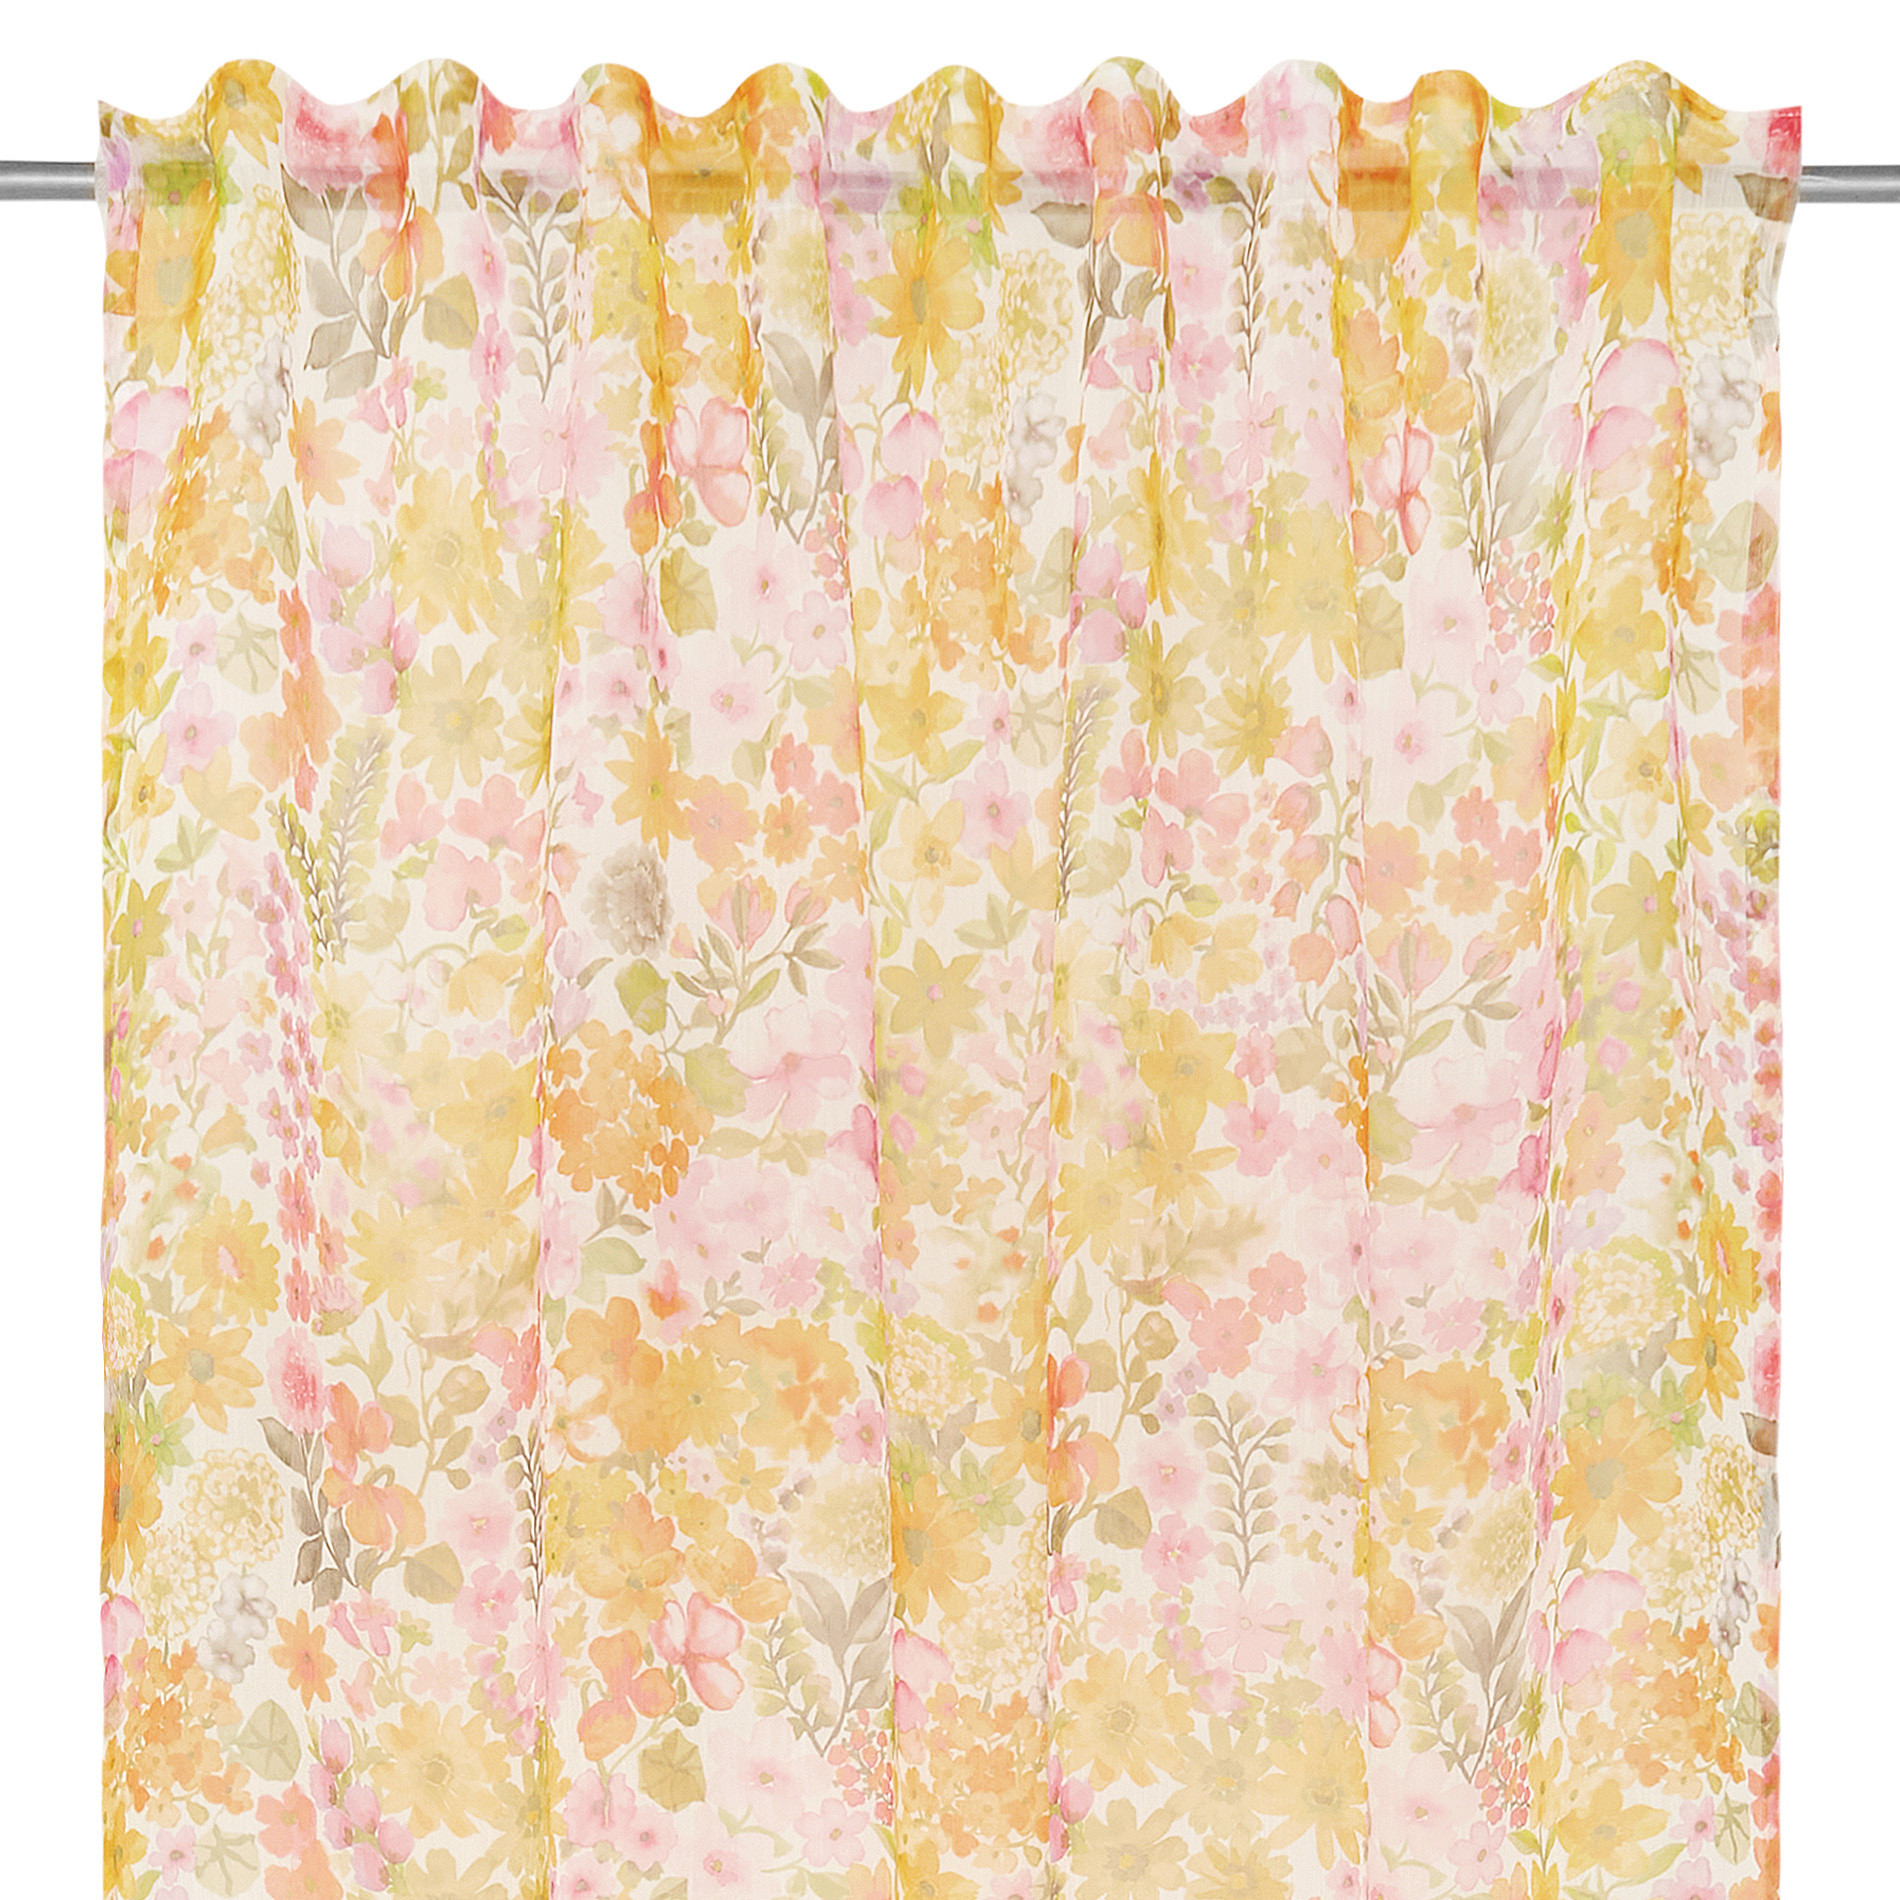 Tenda stampa floreale passanti nascosti, Multicolor, large image number 2